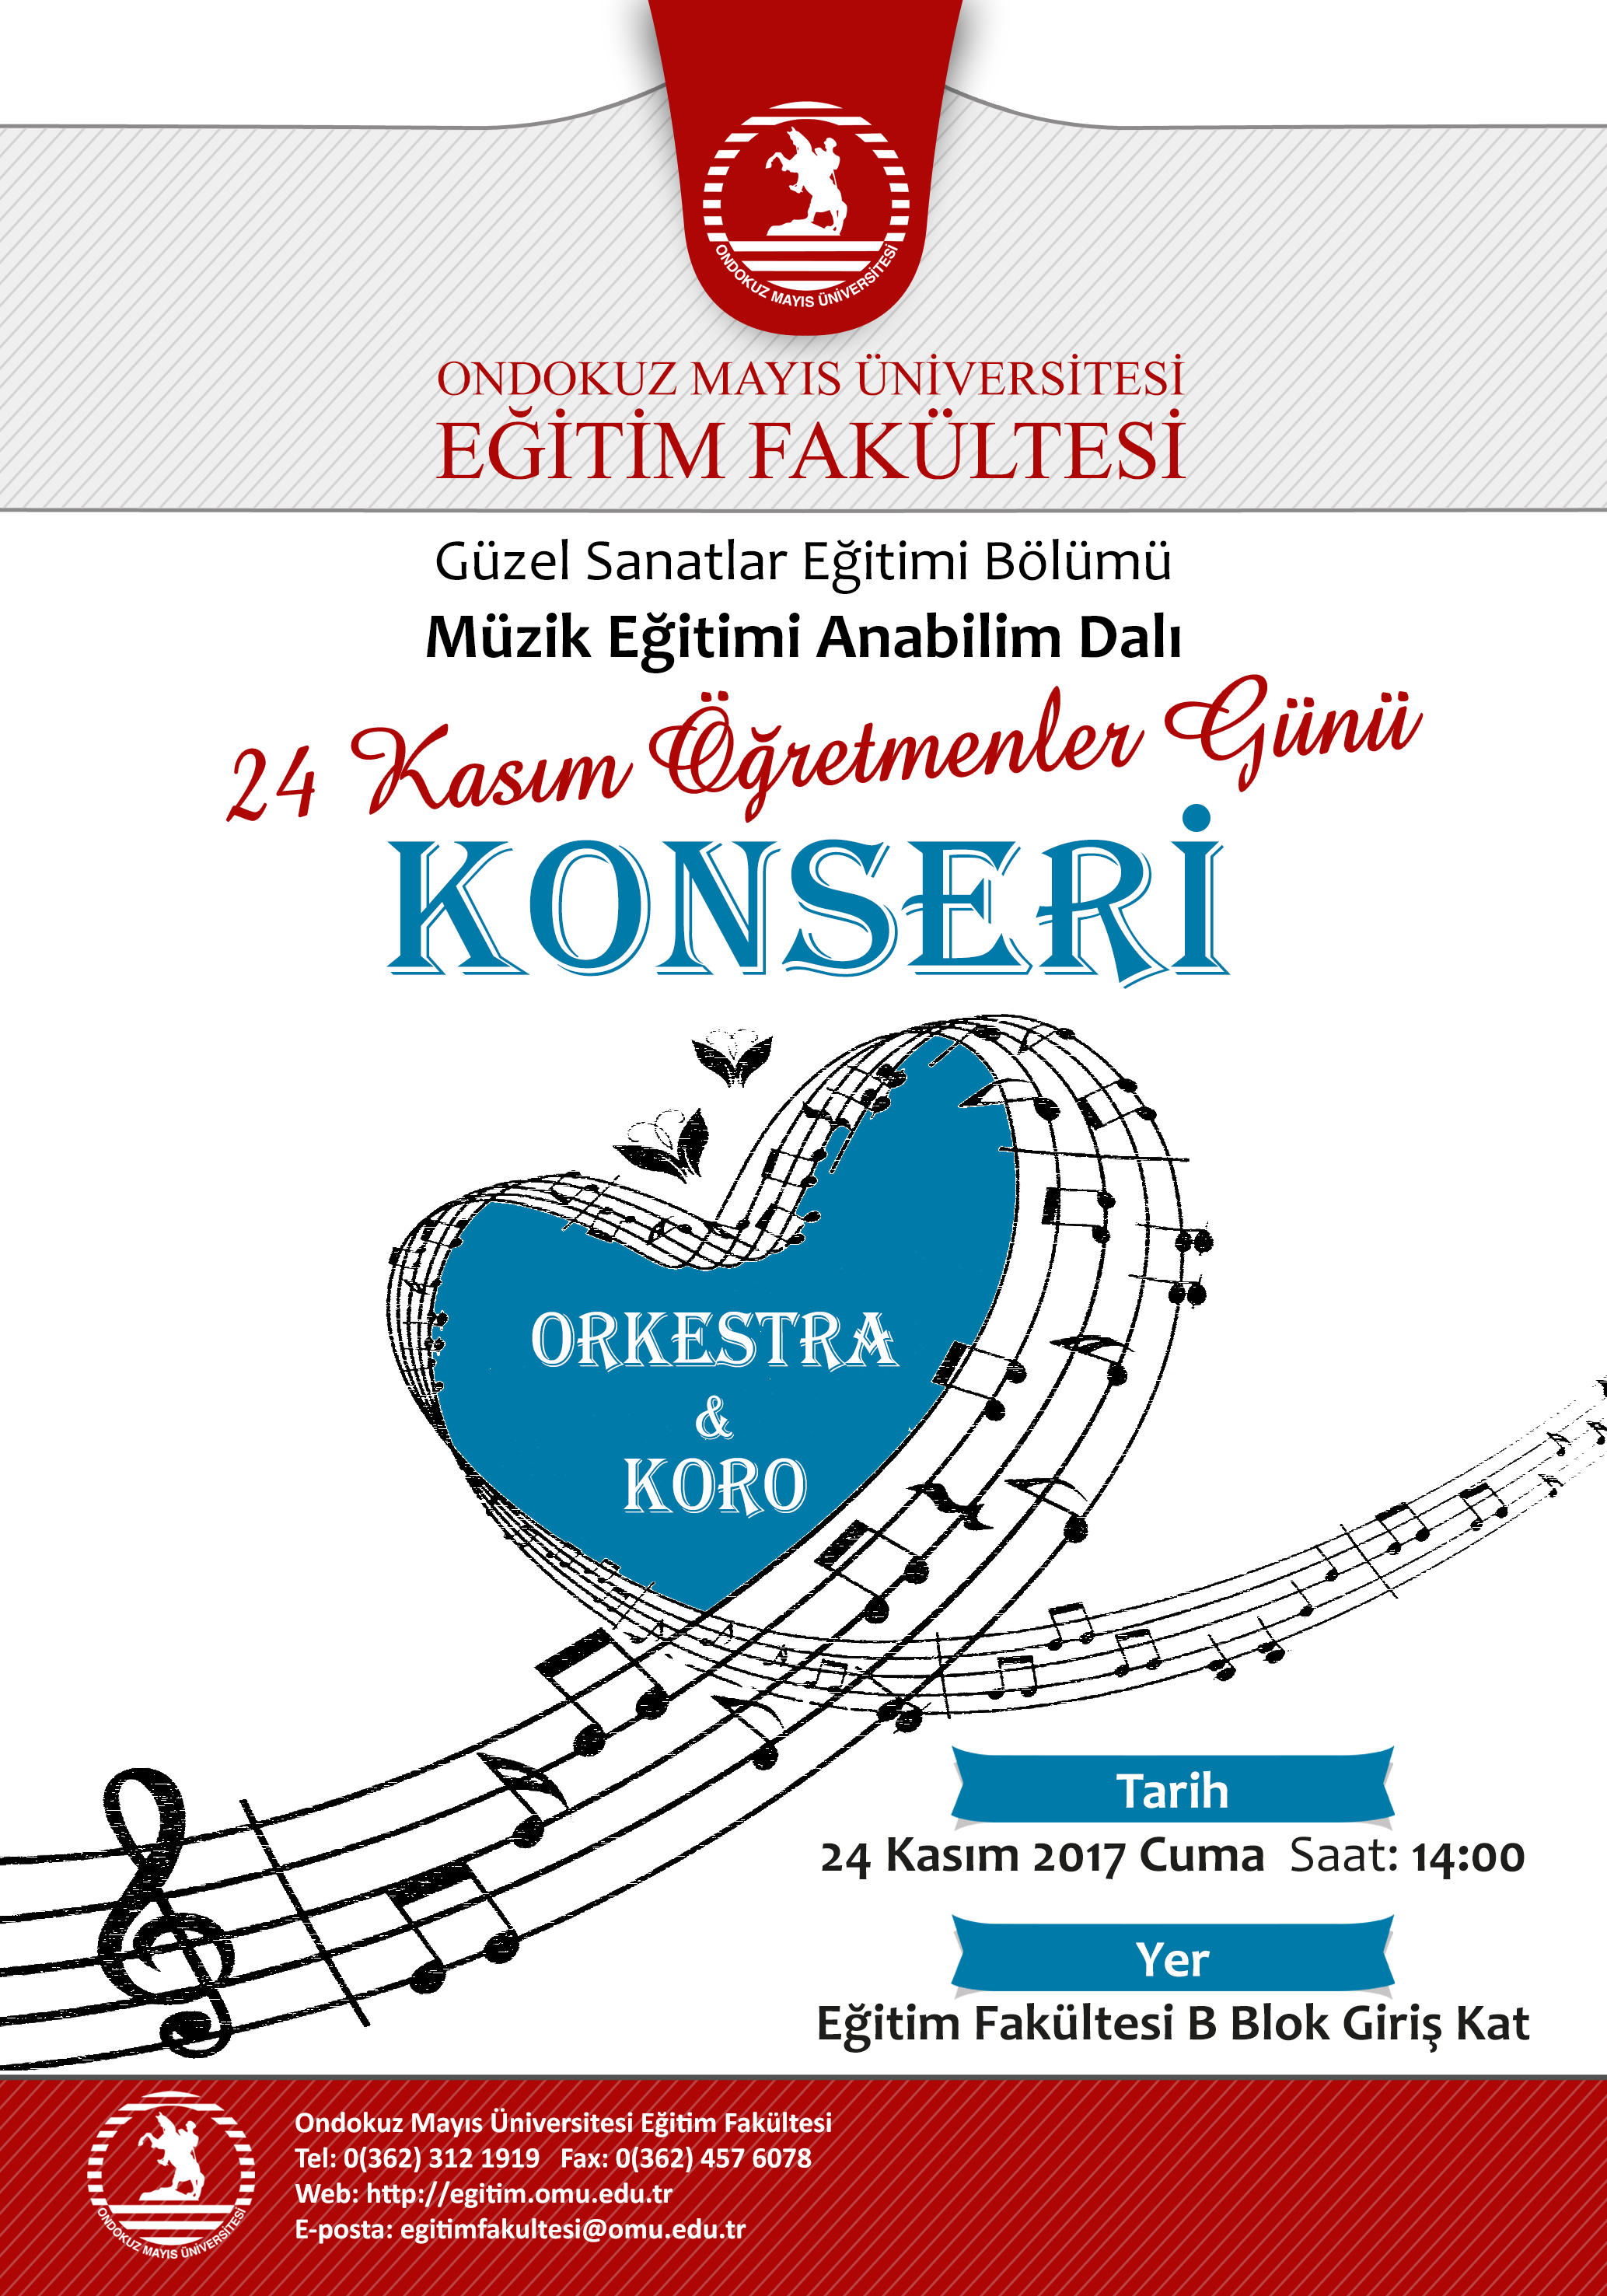 https://www.omu.edu.tr/sites/default/files/muzik_egitimi_24_kasim_konseri_0.png